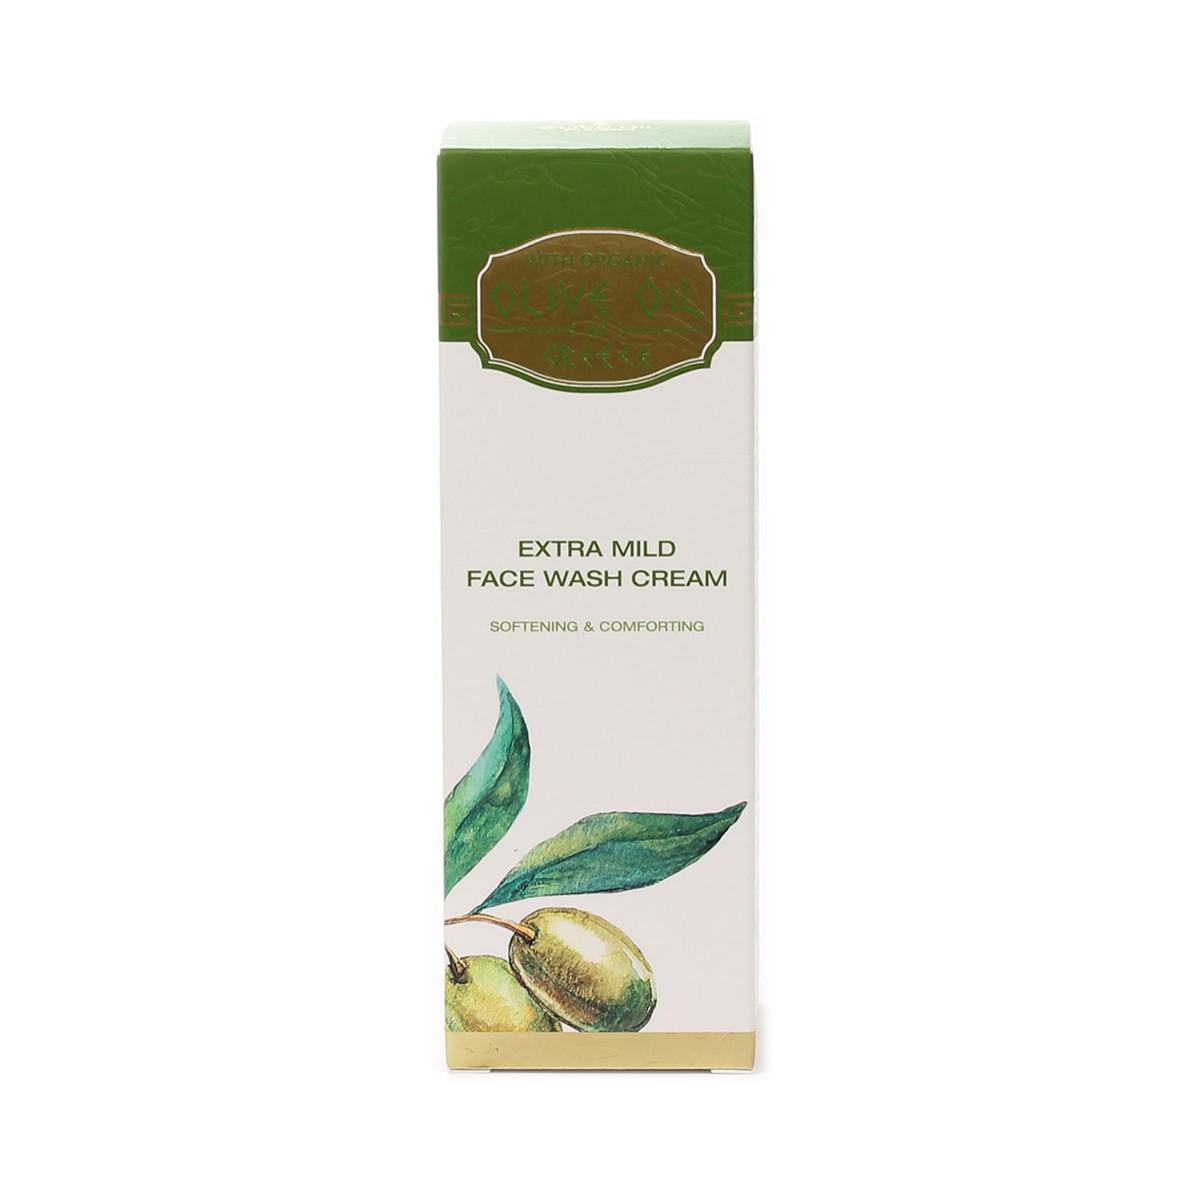 Extra mild face wash cream Olive Oil of Greece Biofresh